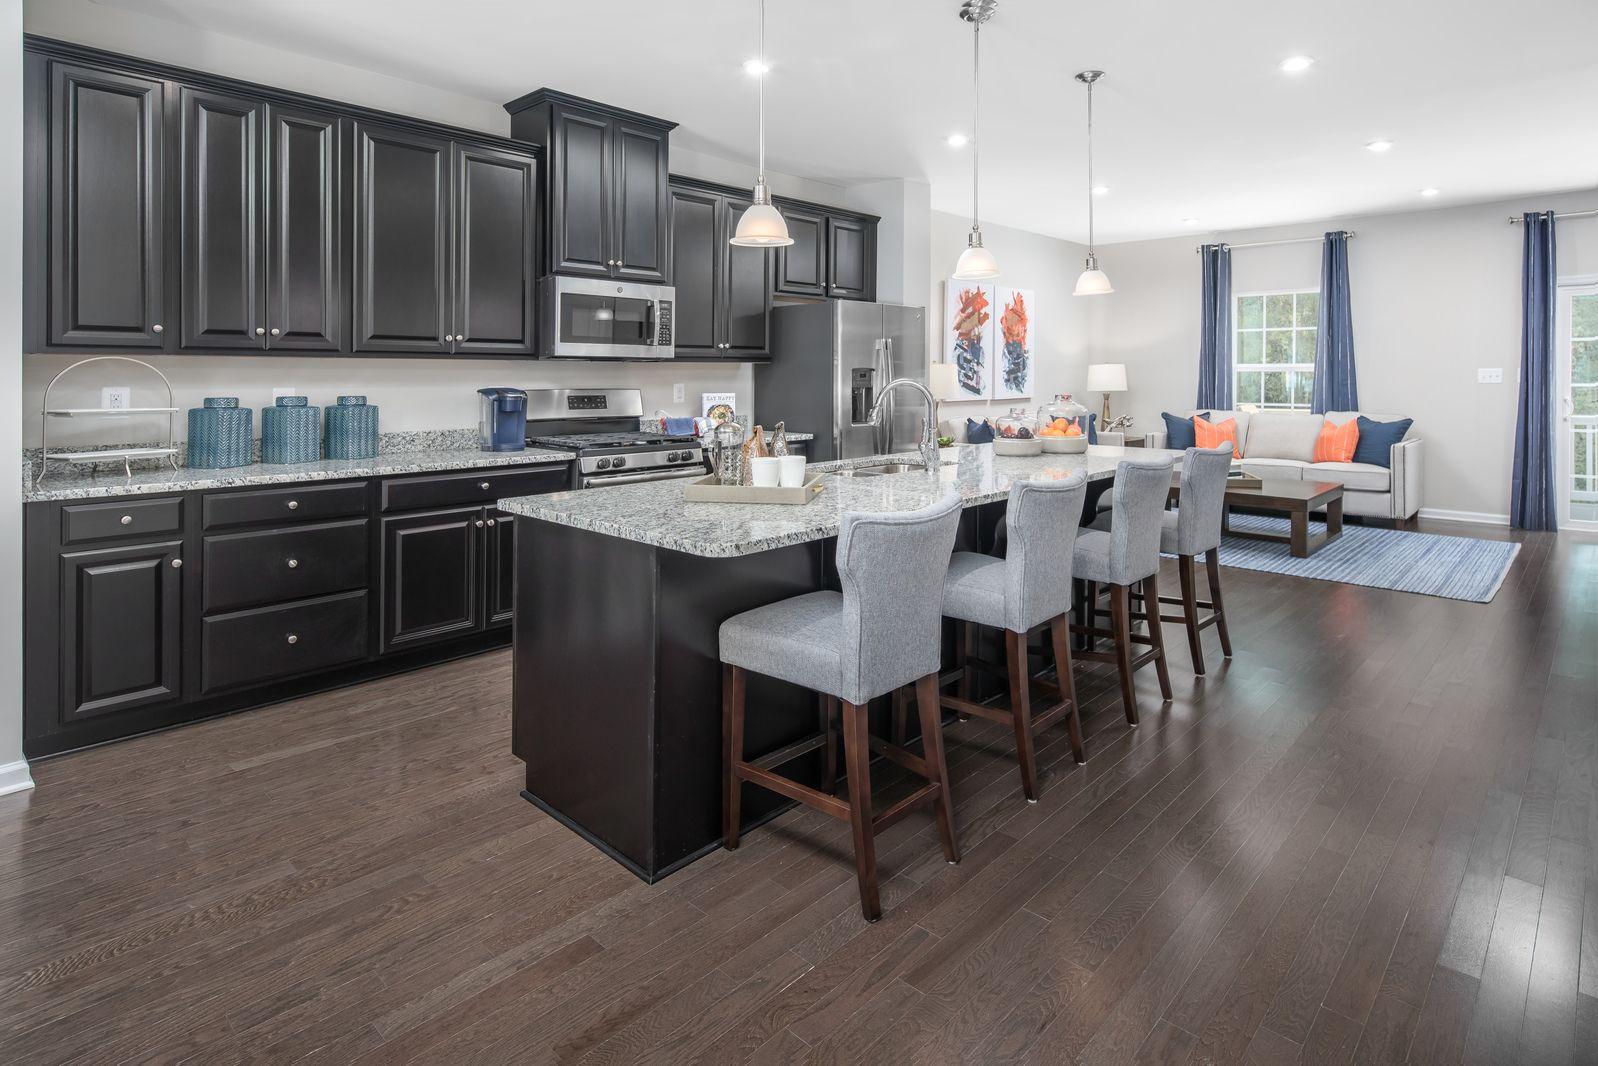 Kitchen featured in the Schubert By Ryan Homes in Washington, VA